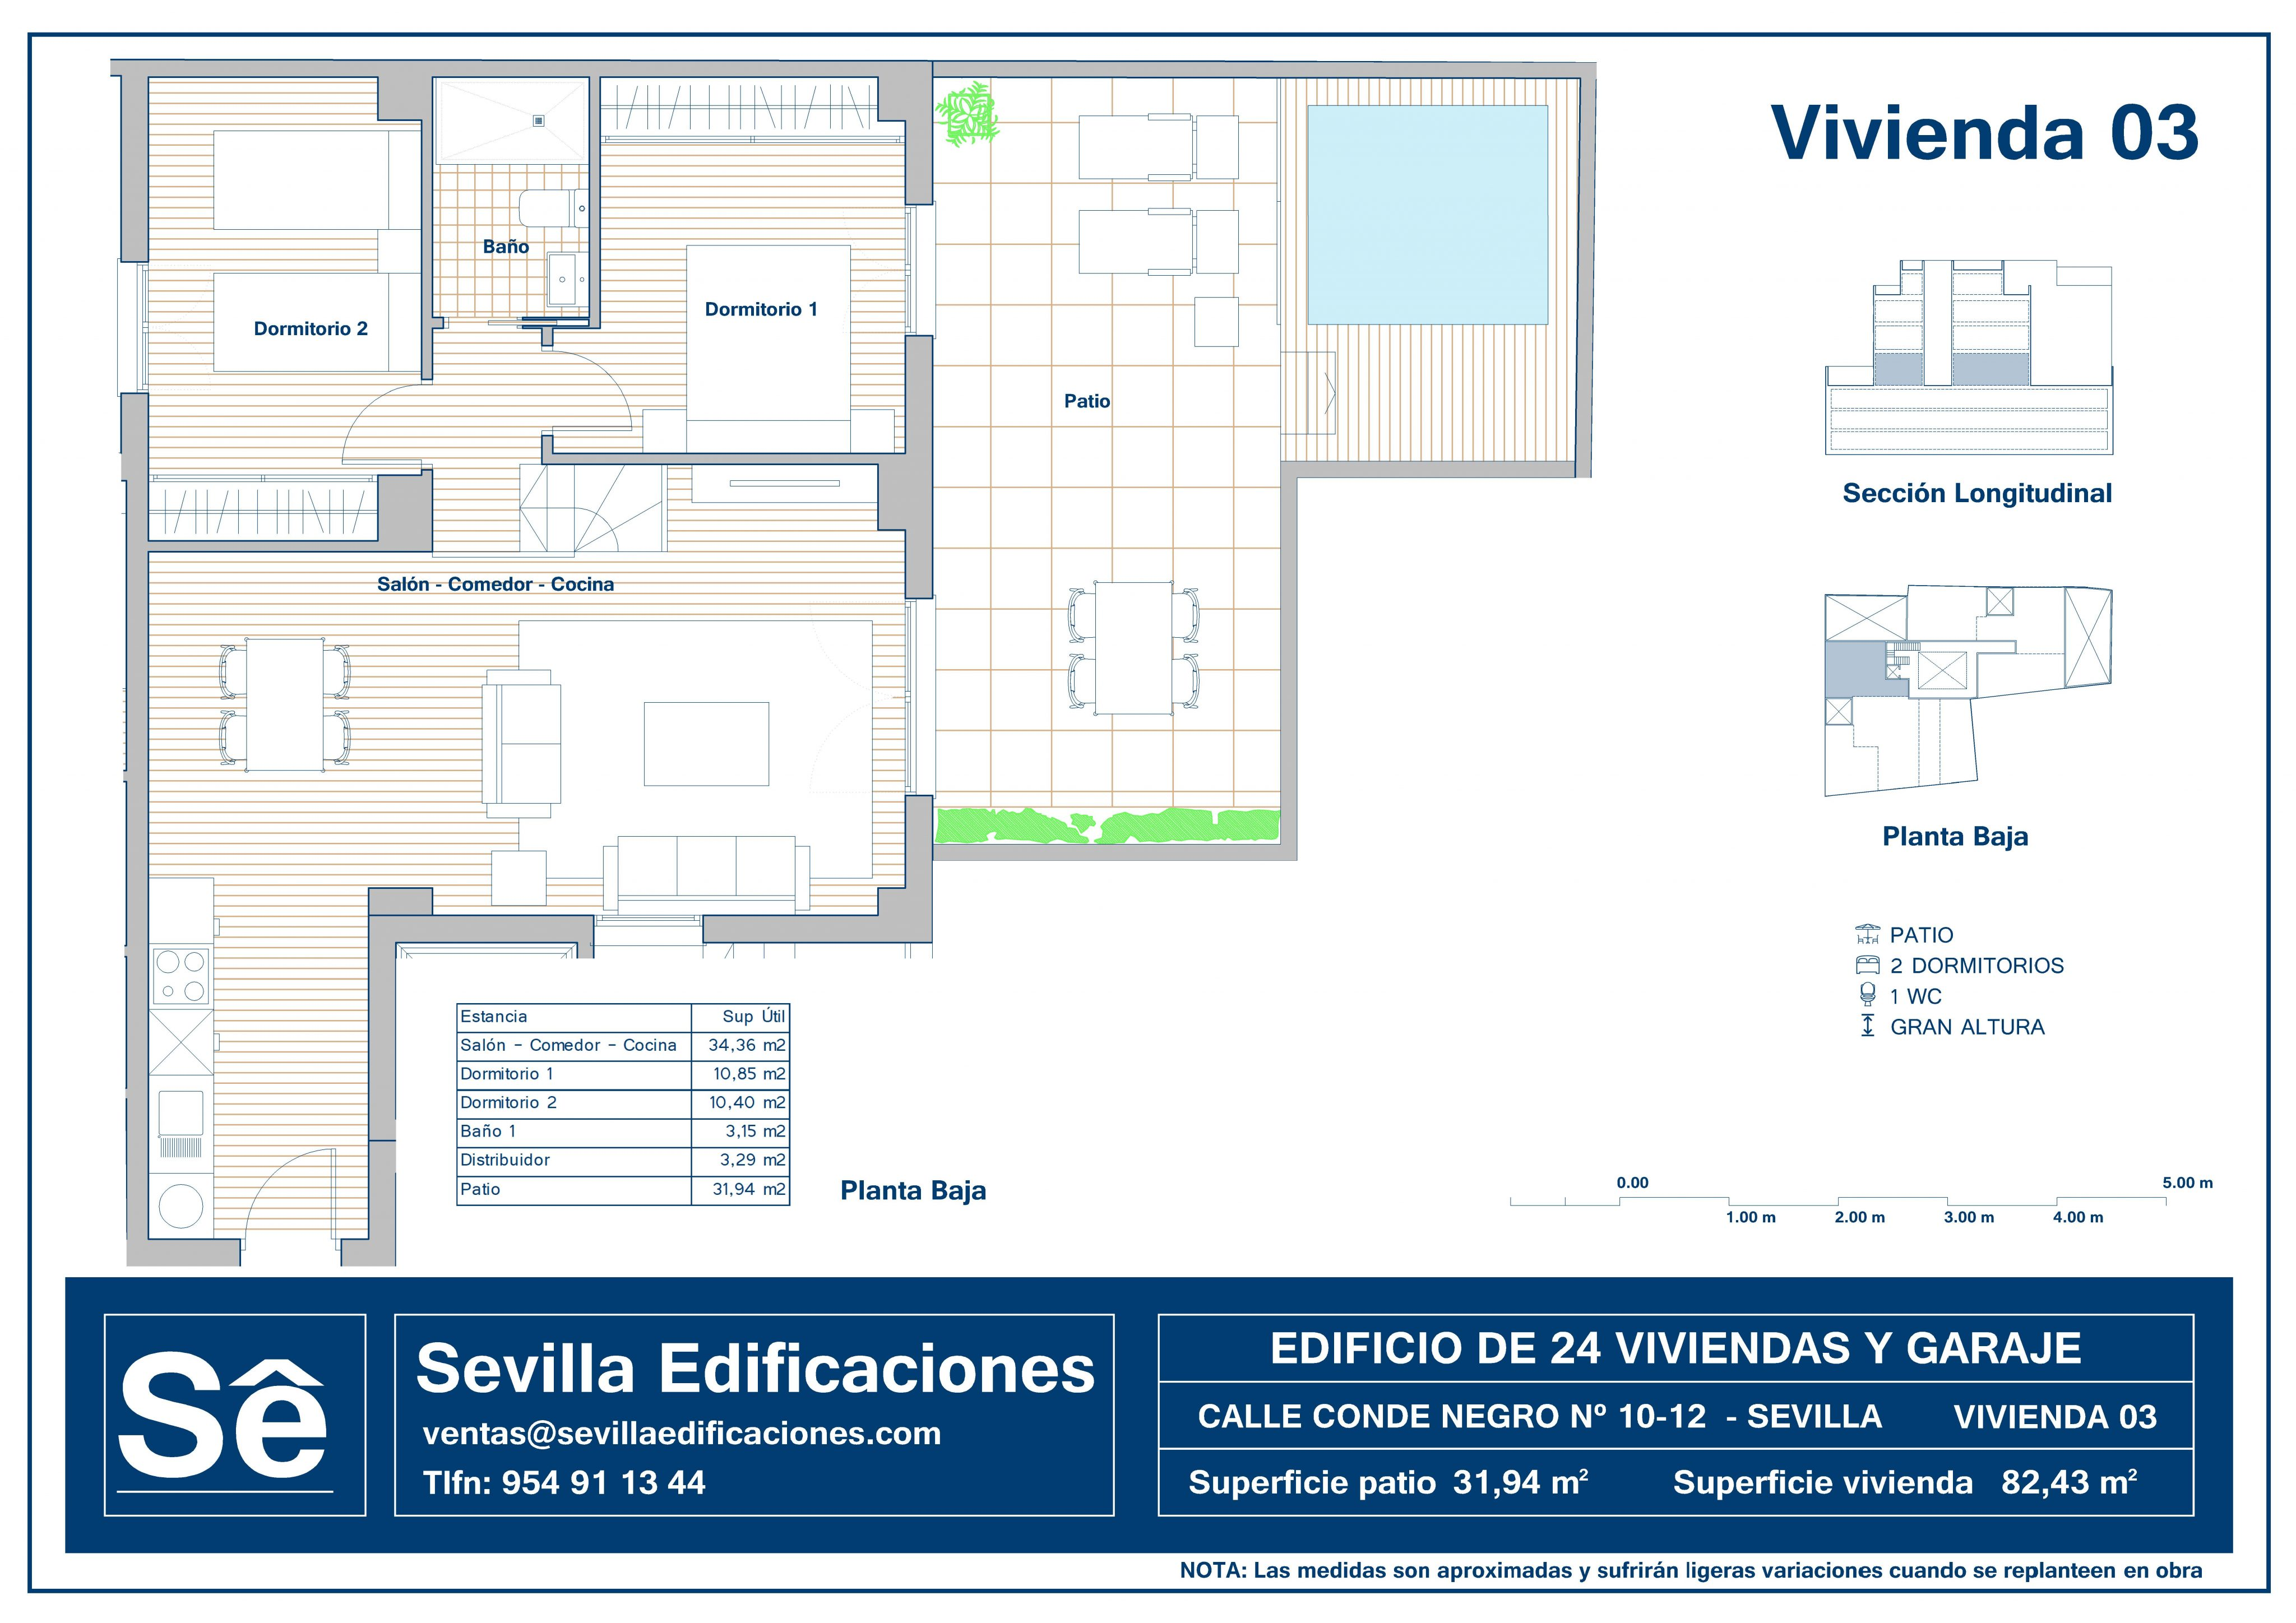 CONDENEGRO_VIVIENDA_03